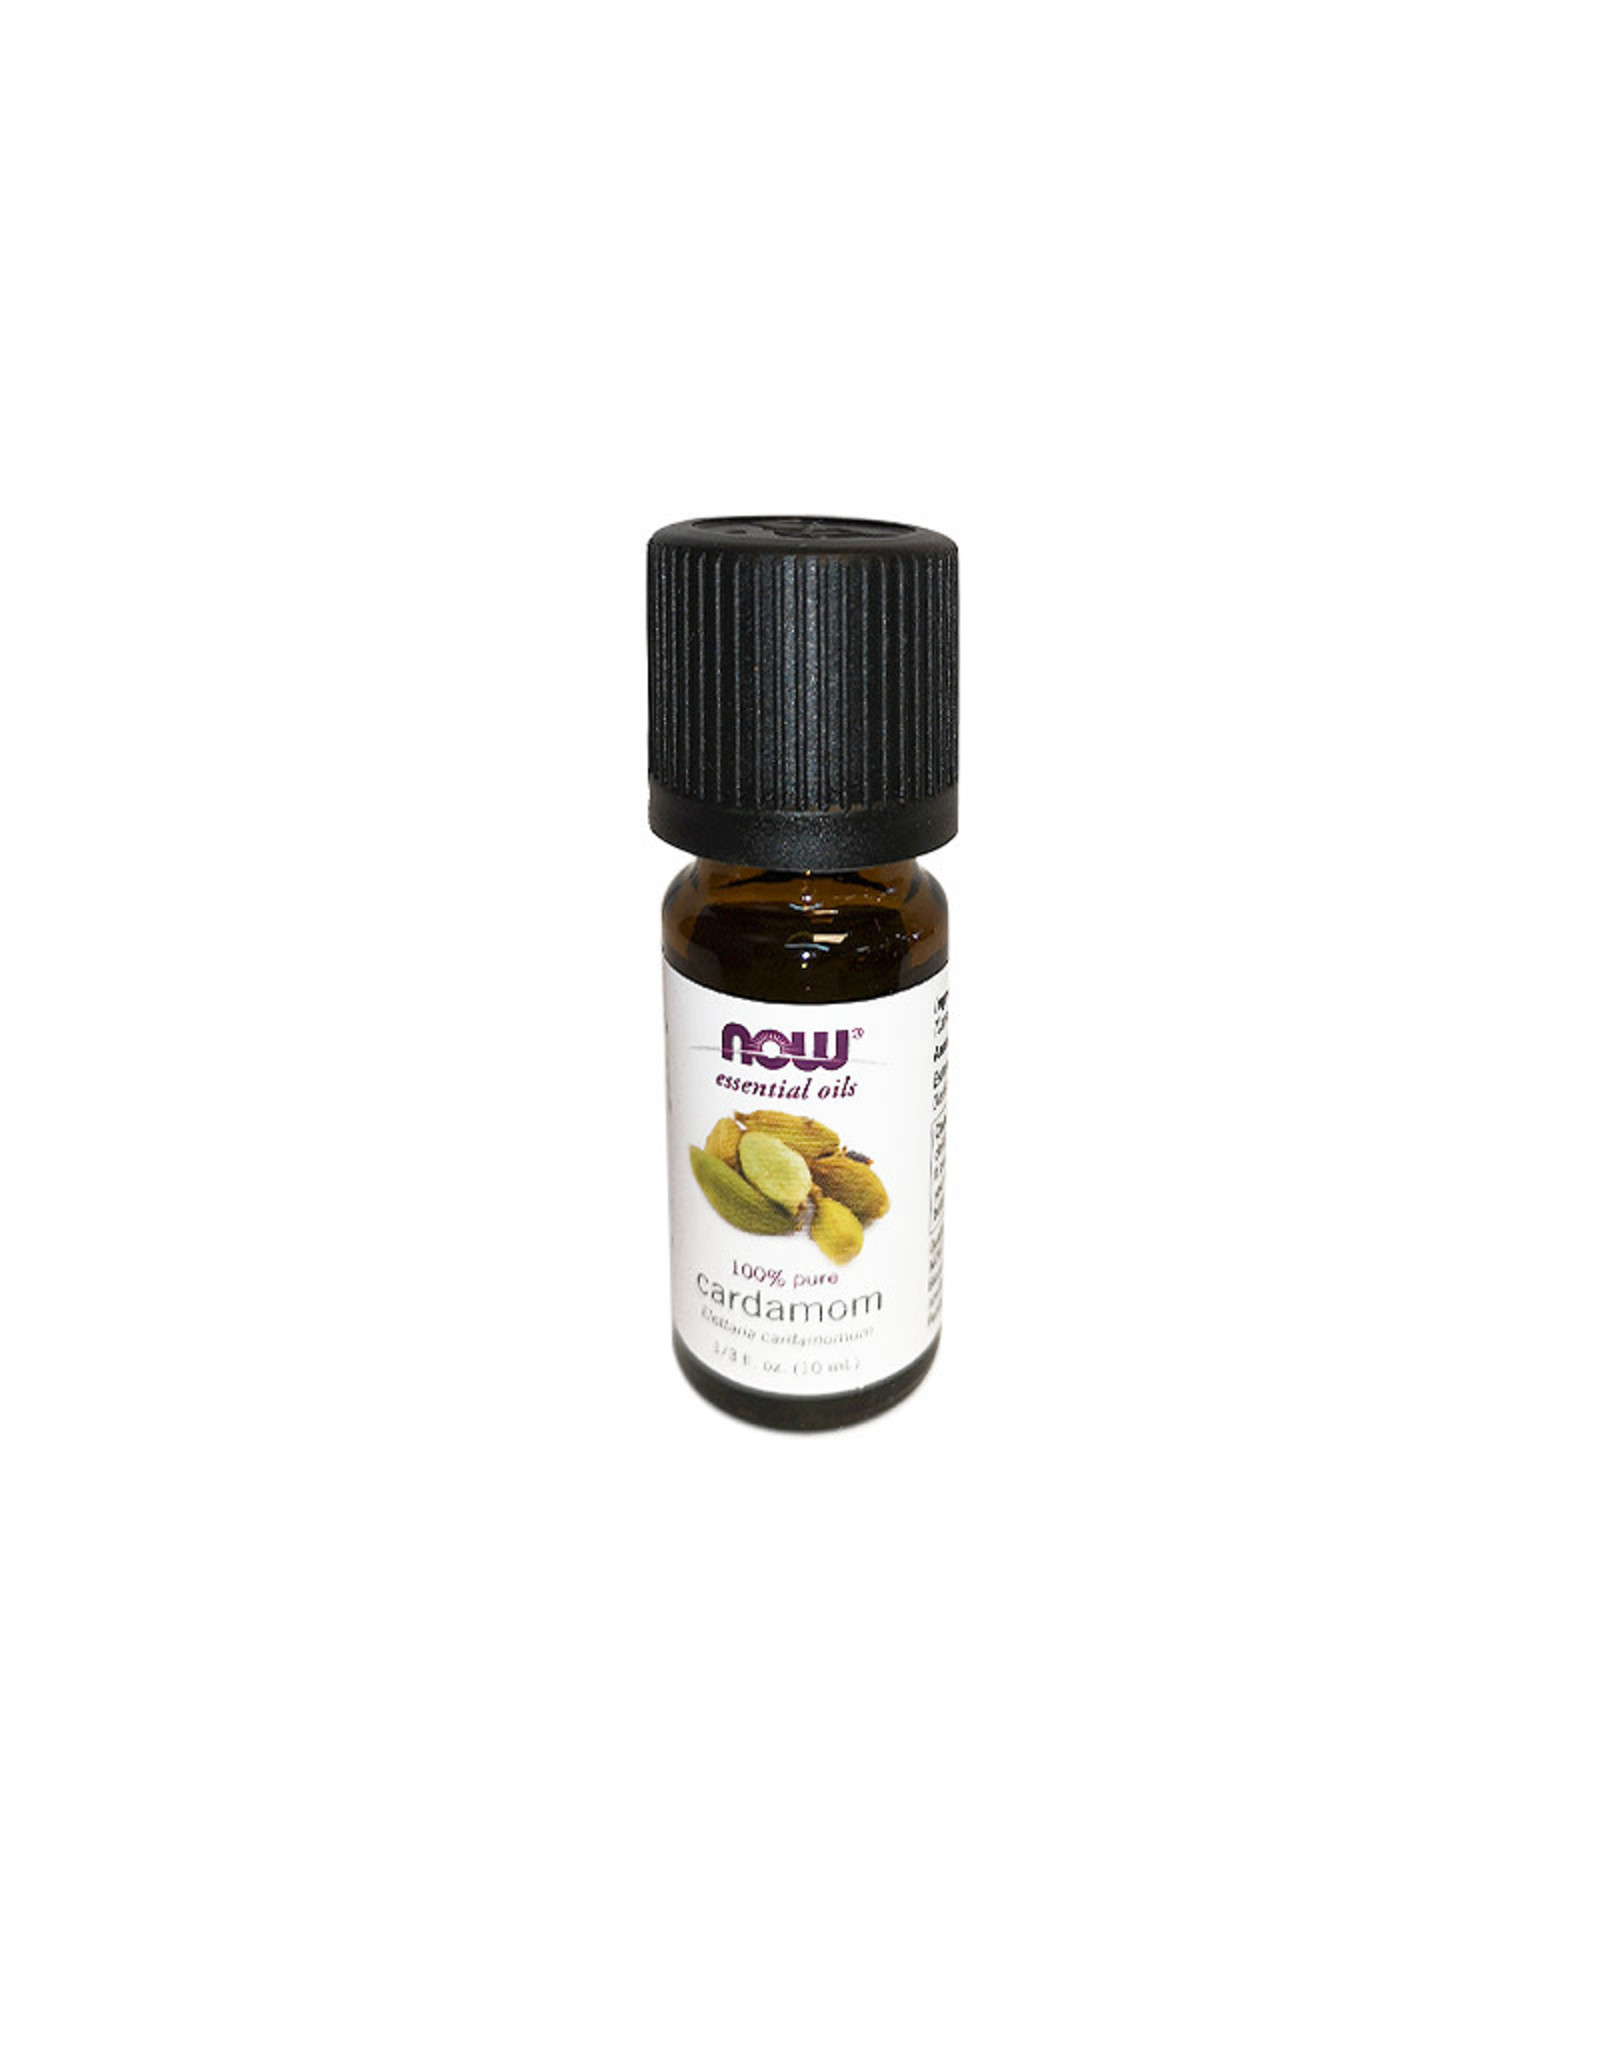 NOW Essential Oils NOW Essential Oils - Cardamom Oil (10ml)